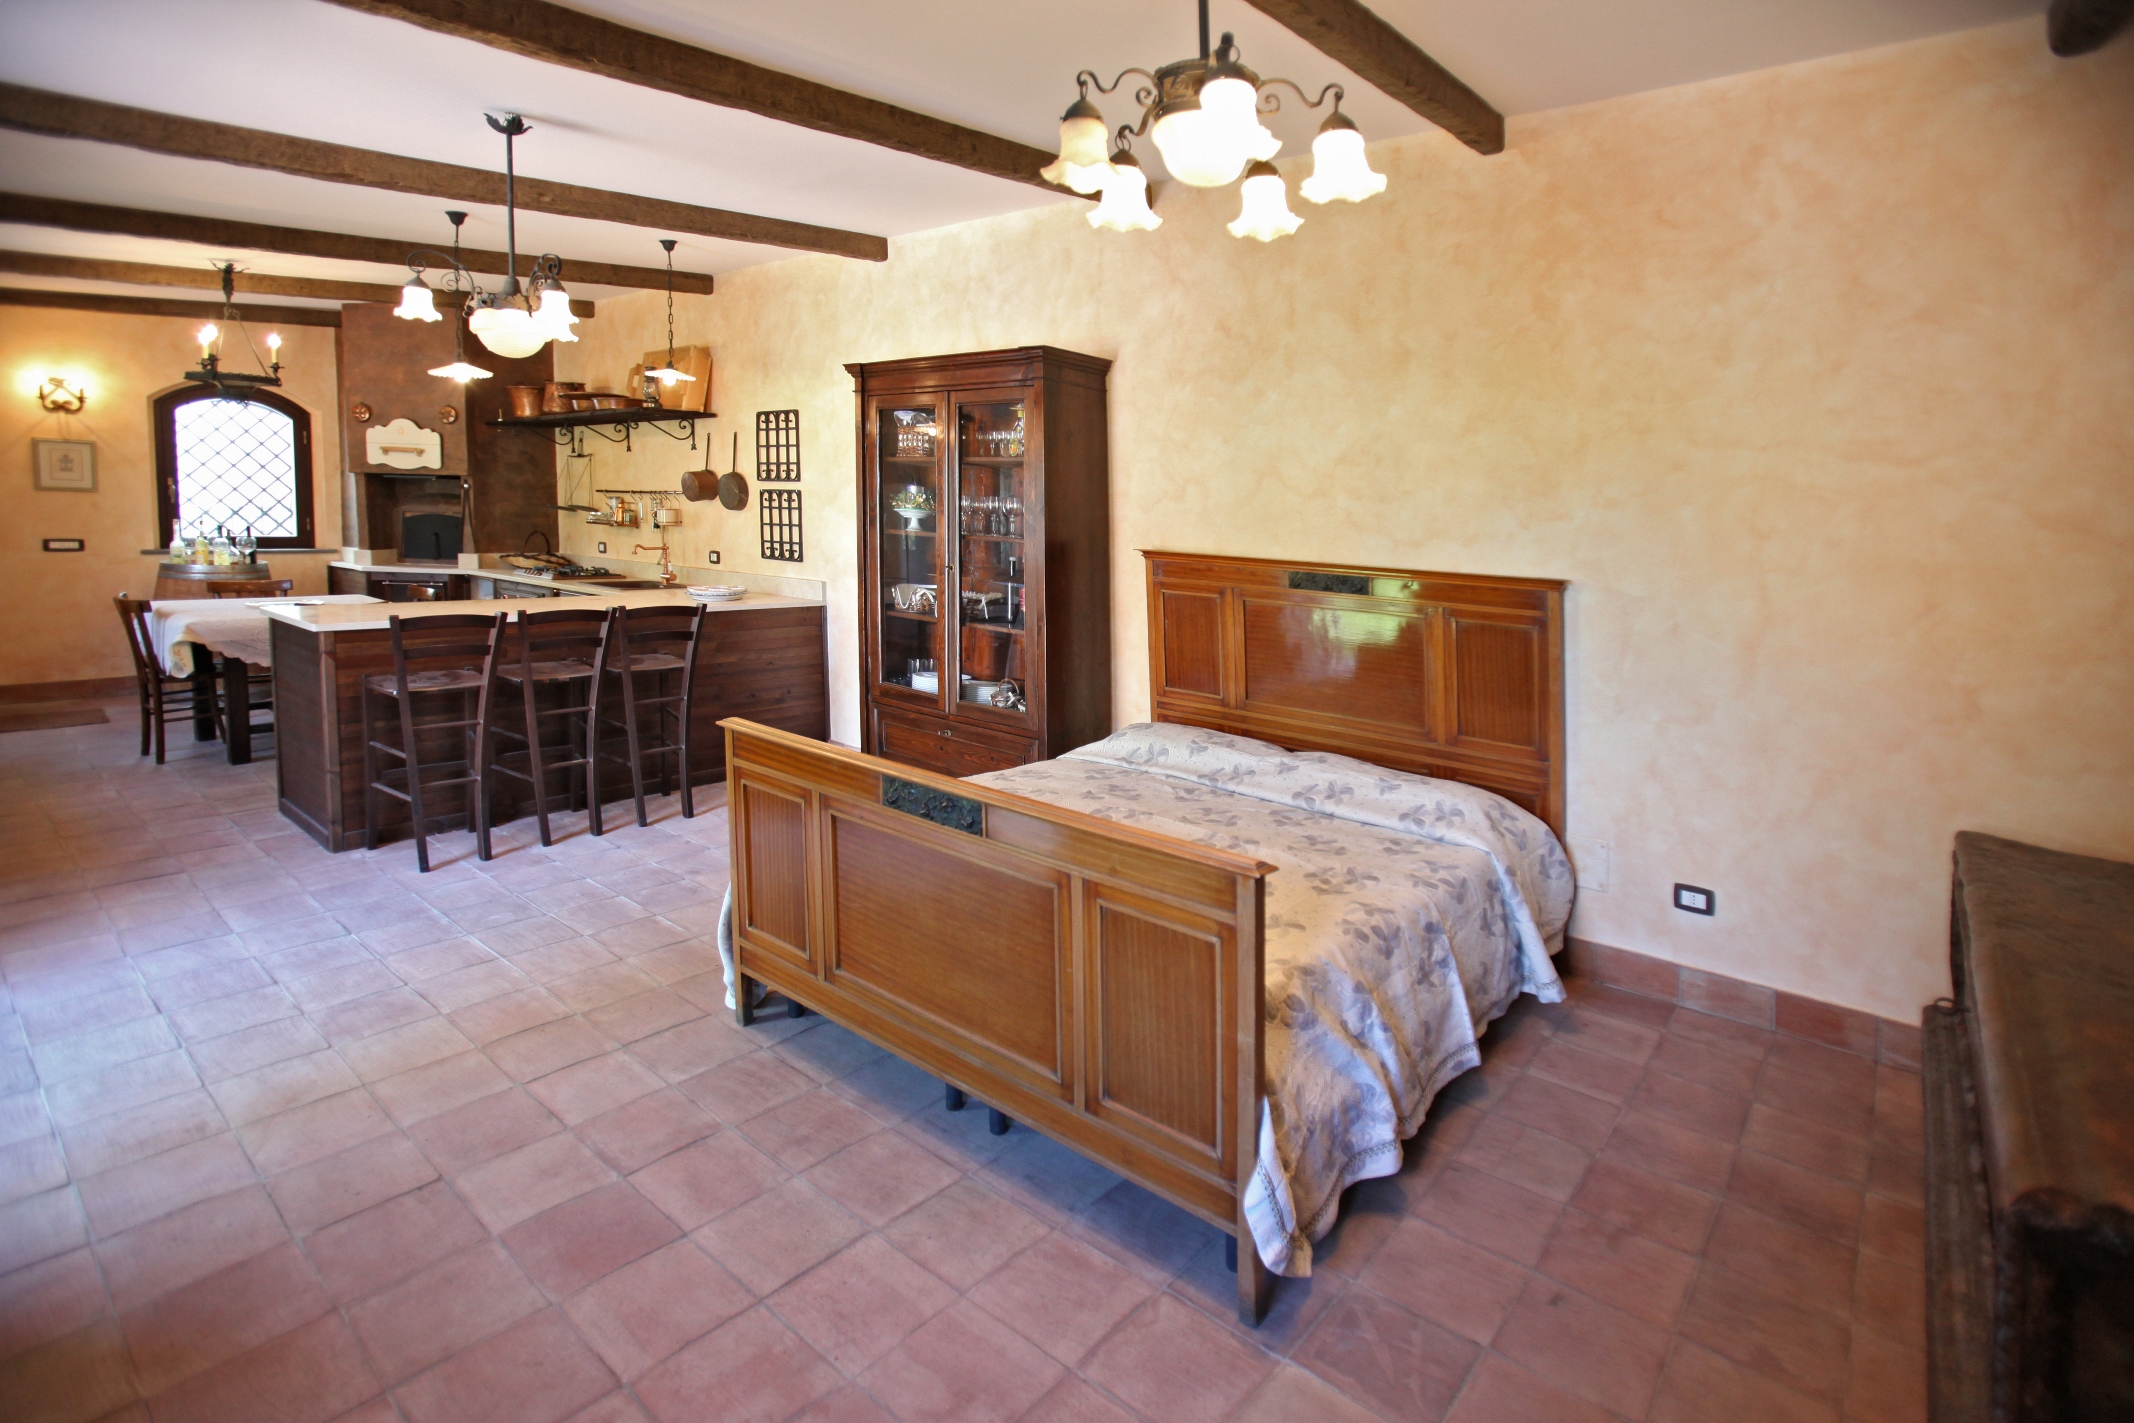 Maison de vacances A Casa di Ludo mit parkplatz (2124257), Catania, Catania, Sicile, Italie, image 19